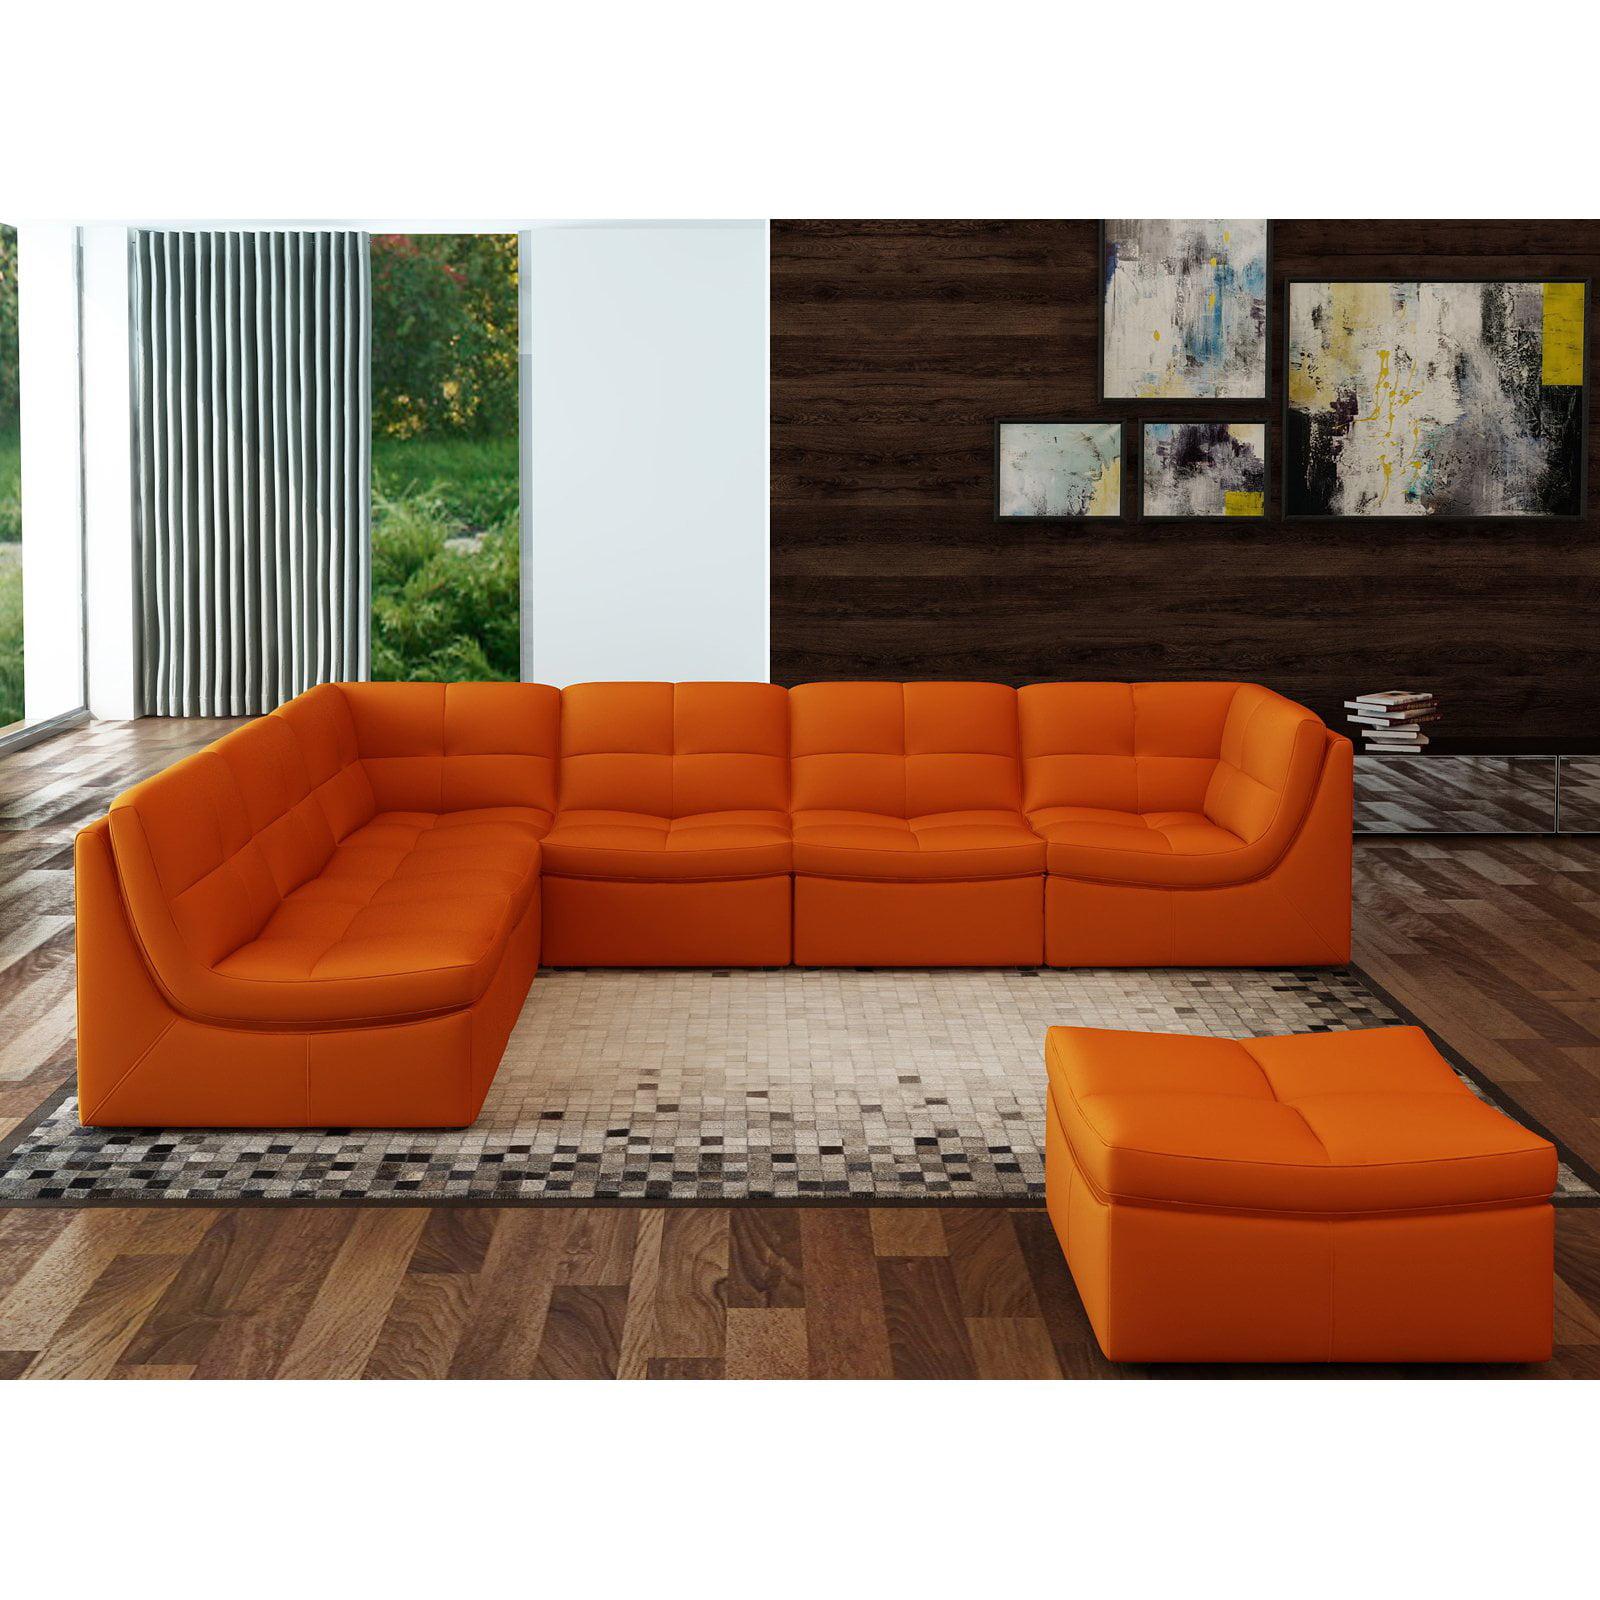 J Amp M Furniture Lego 7 Piece Sectional Sofa Set Walmart Com